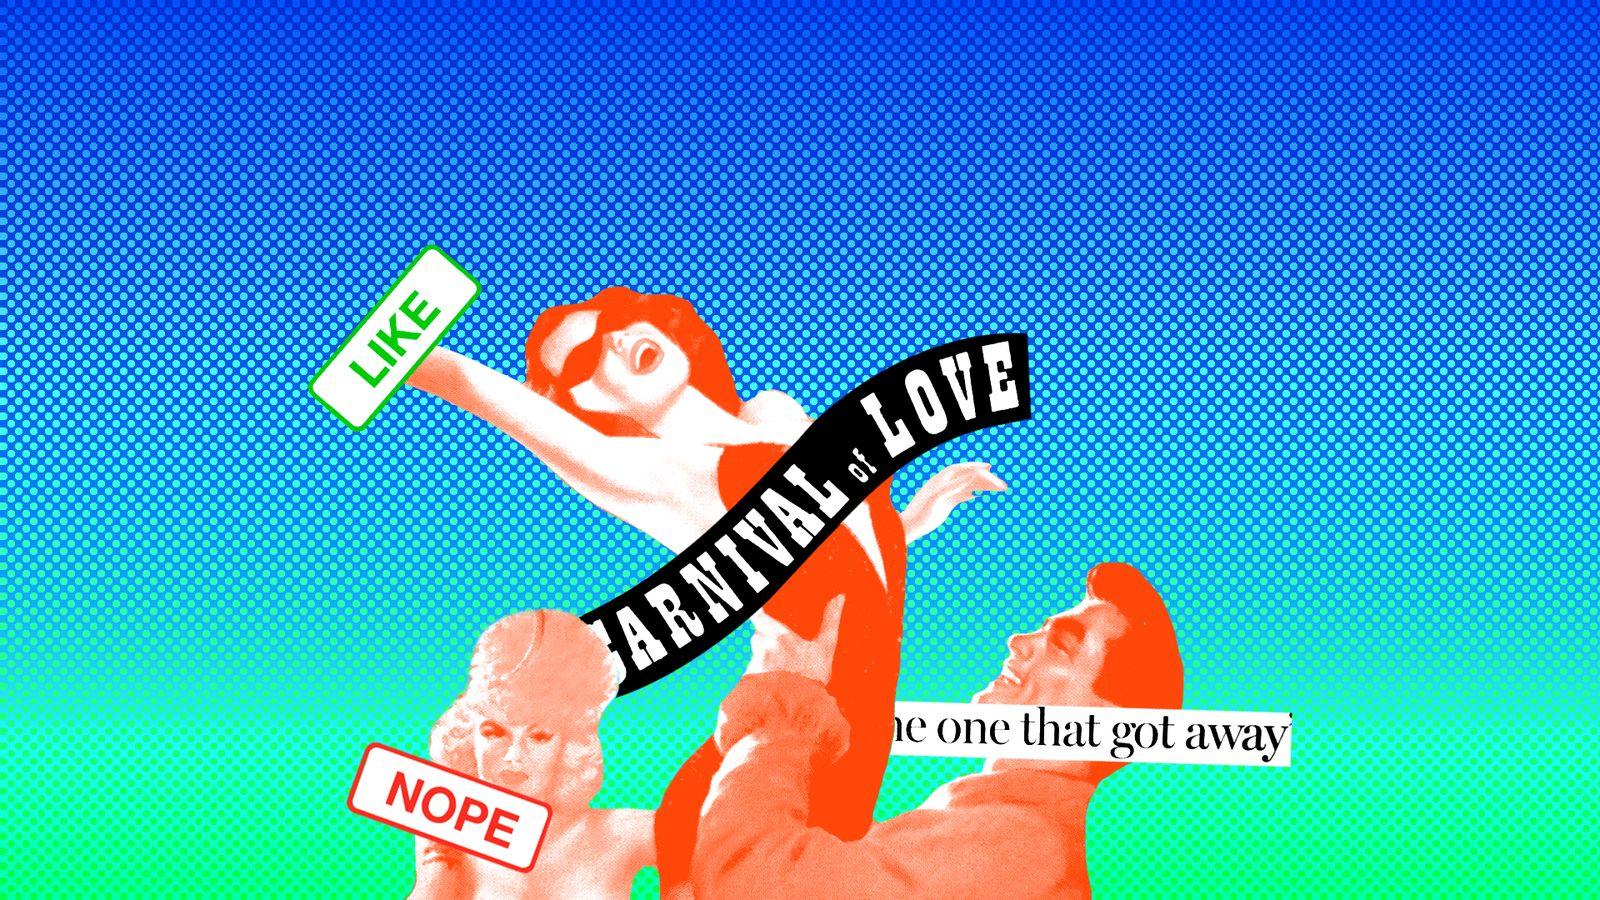 e ægte hollywood historie online dating